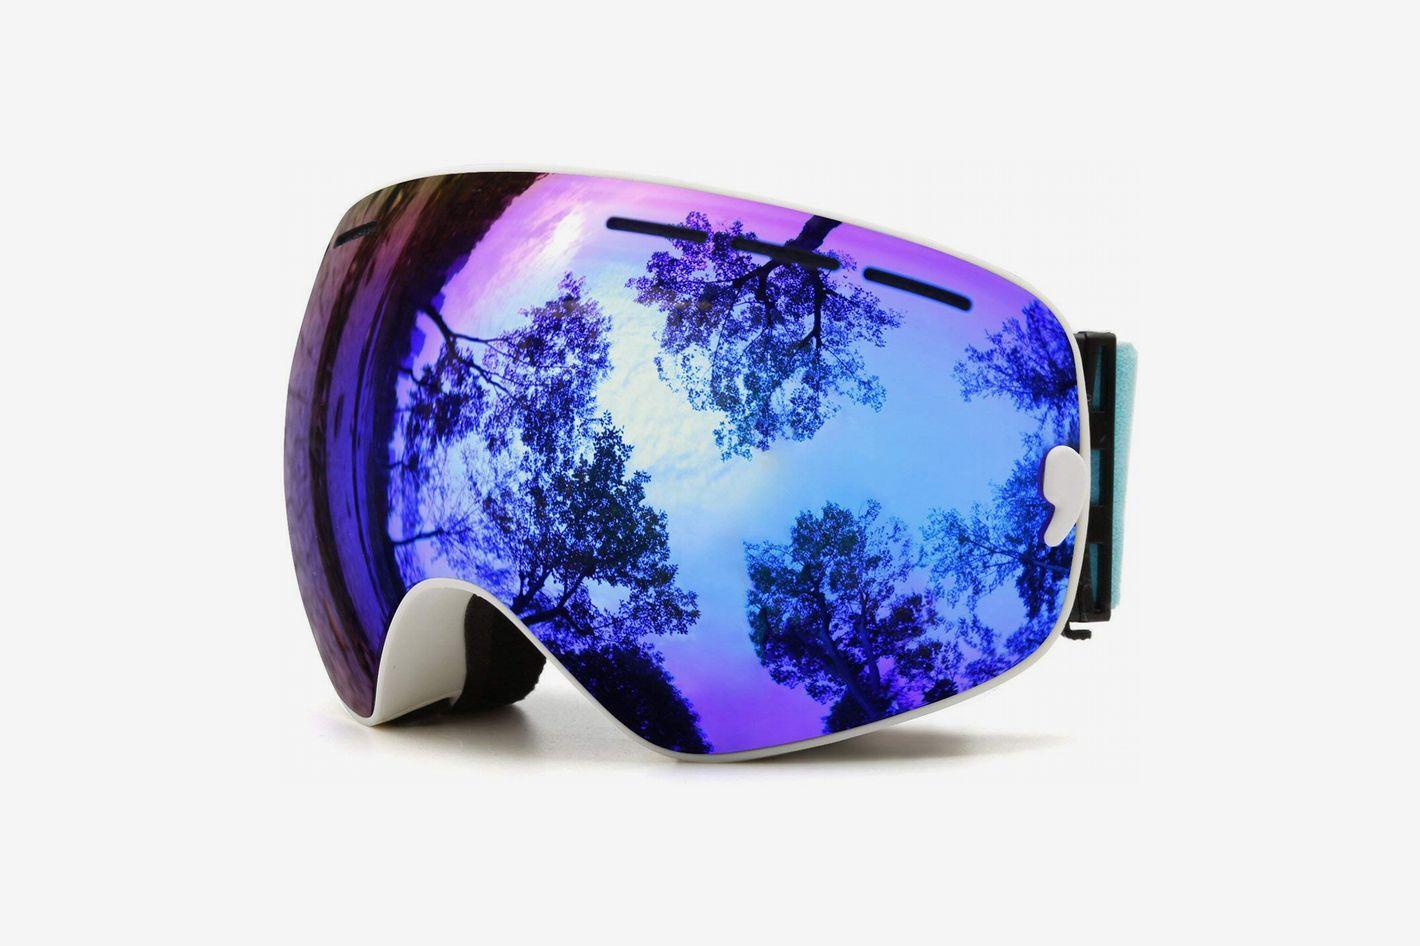 032fae486ec3 12 Best Ski Goggles 2019